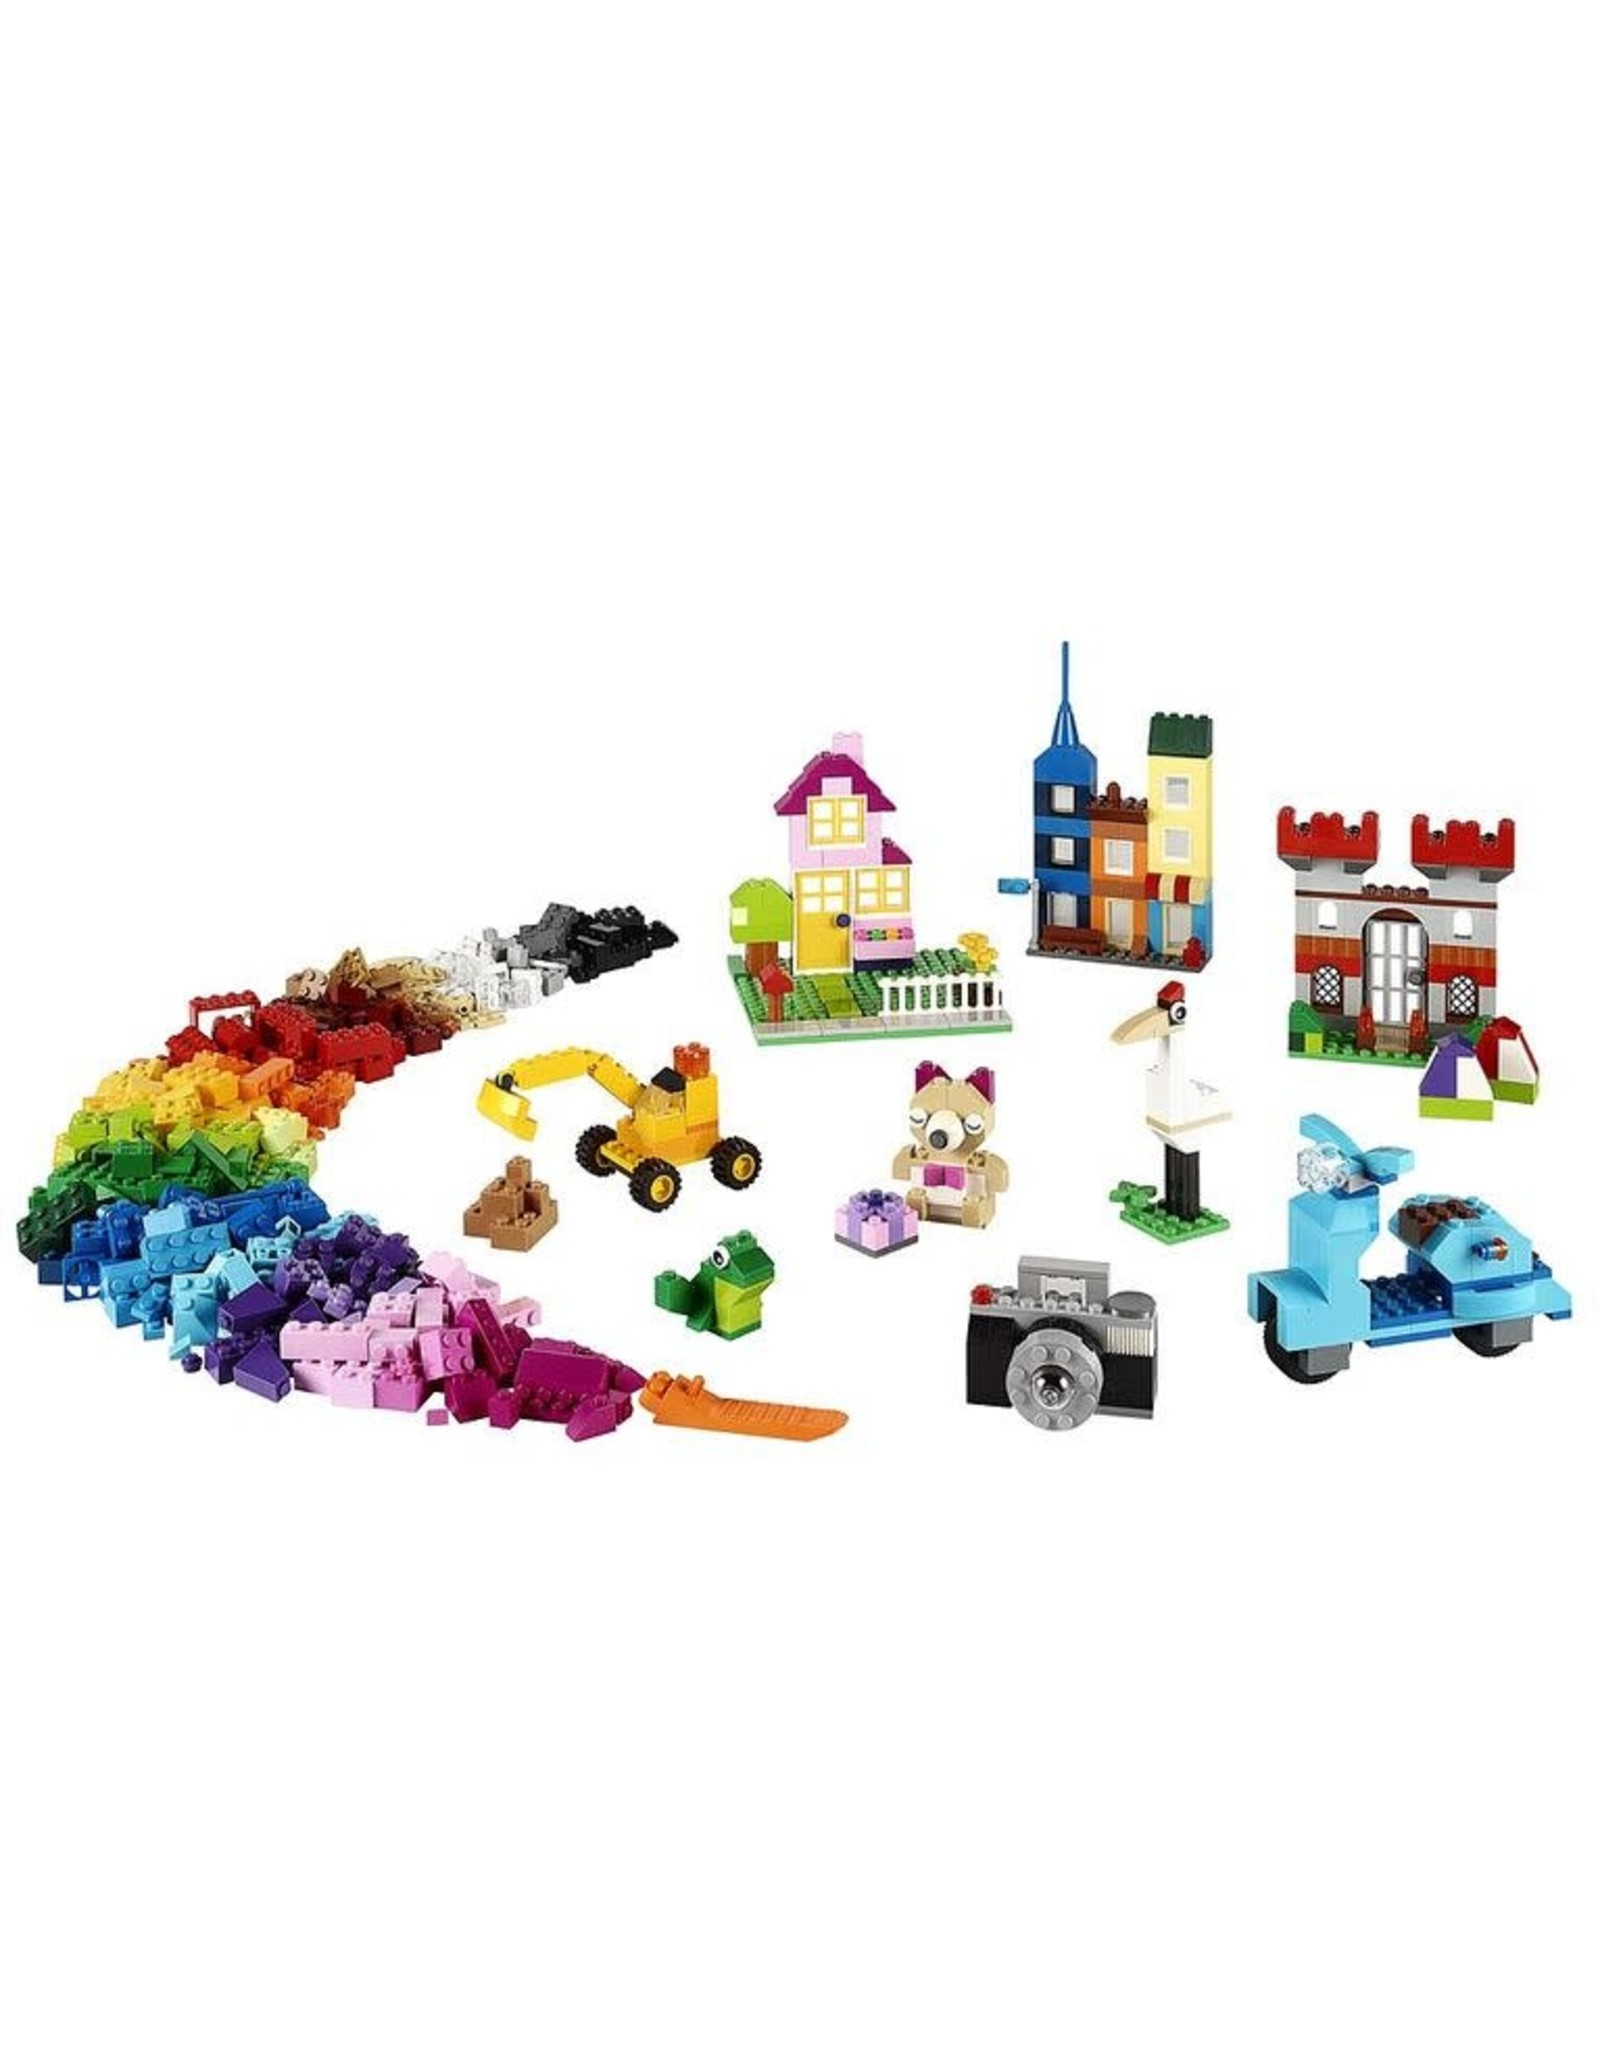 LEGO LEGO Classic, Large Creative Brick Box